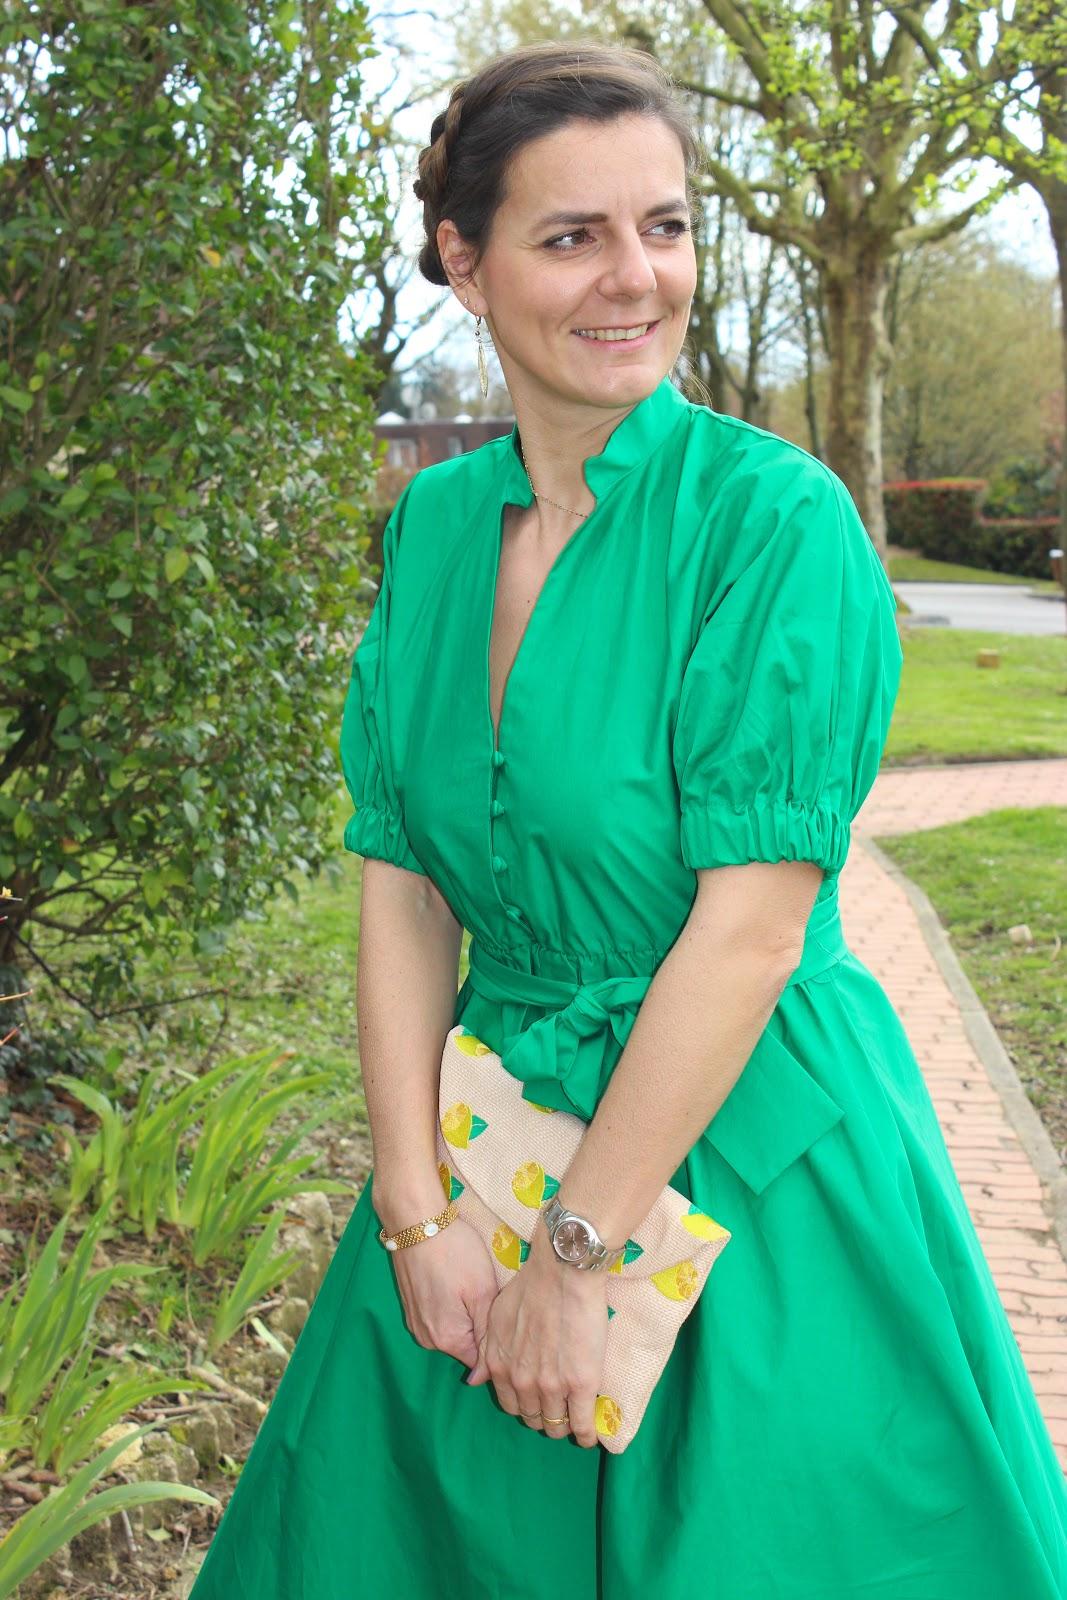 robe verte zara, pochette minelli, escarpins san marina les petites bulles de ma vie